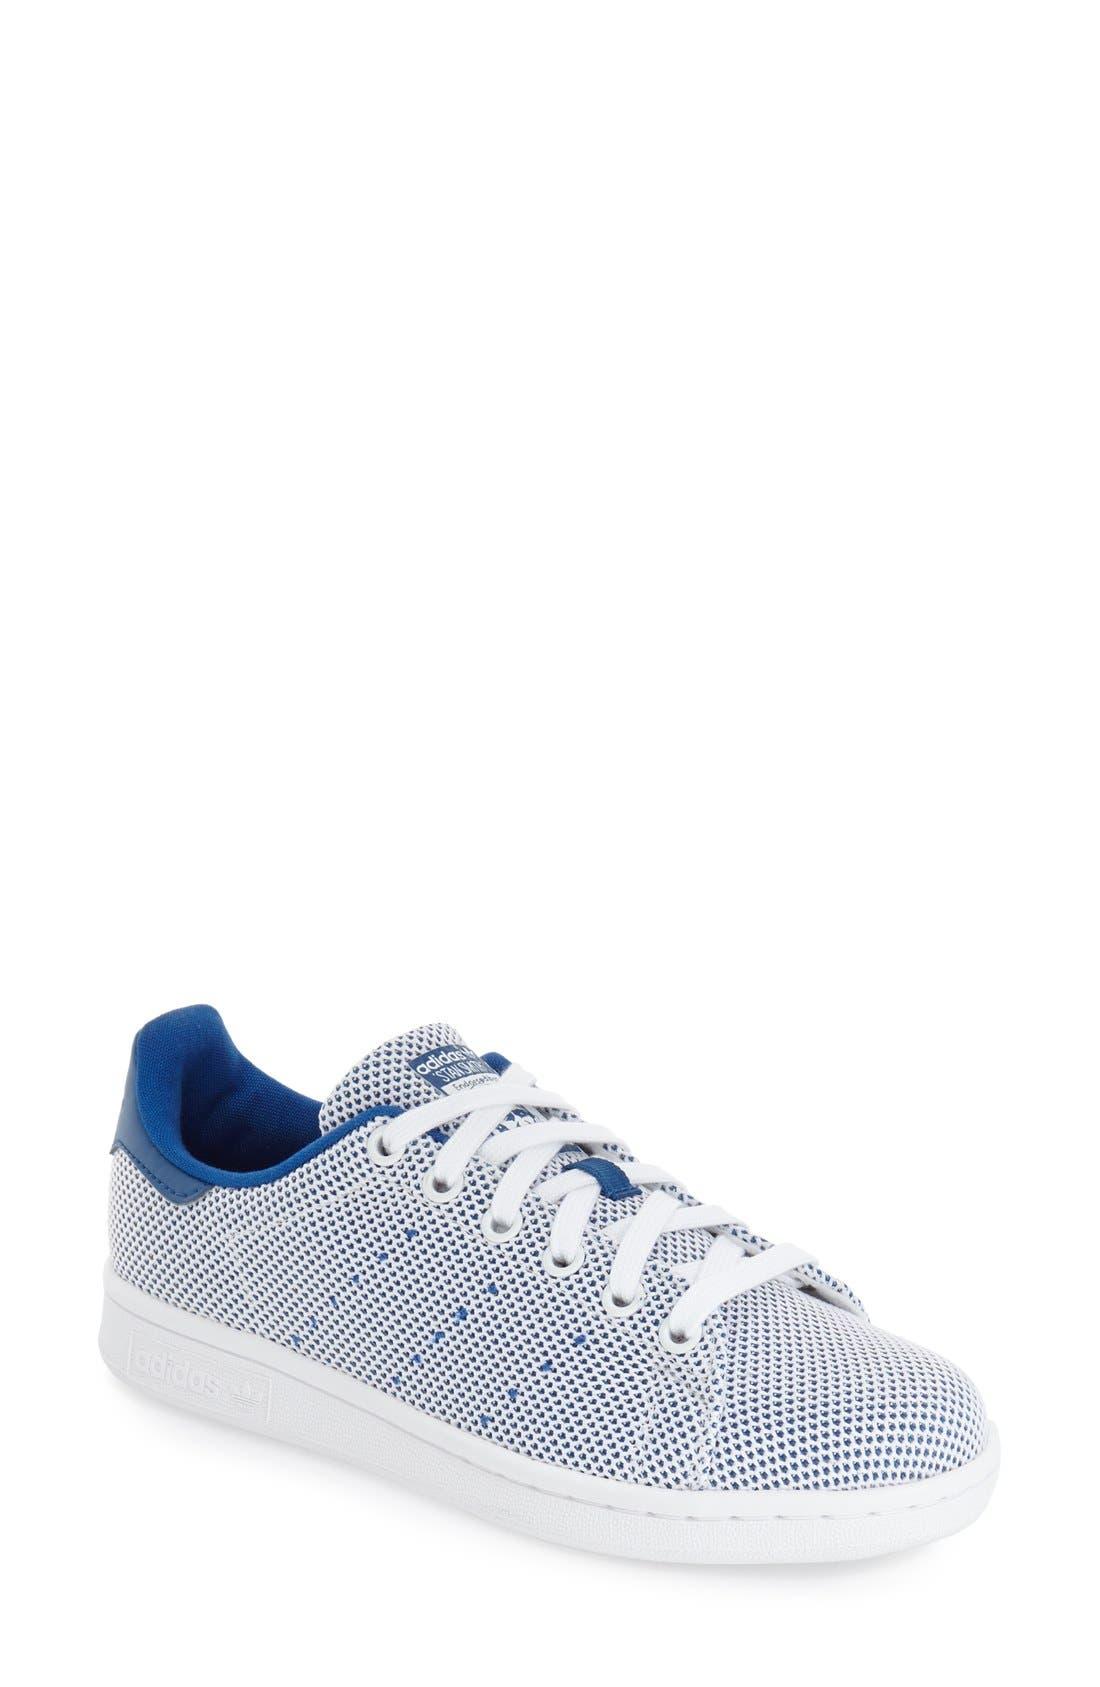 Alternate Image 1 Selected - adidas 'Stan Smith' Sneaker (Women)